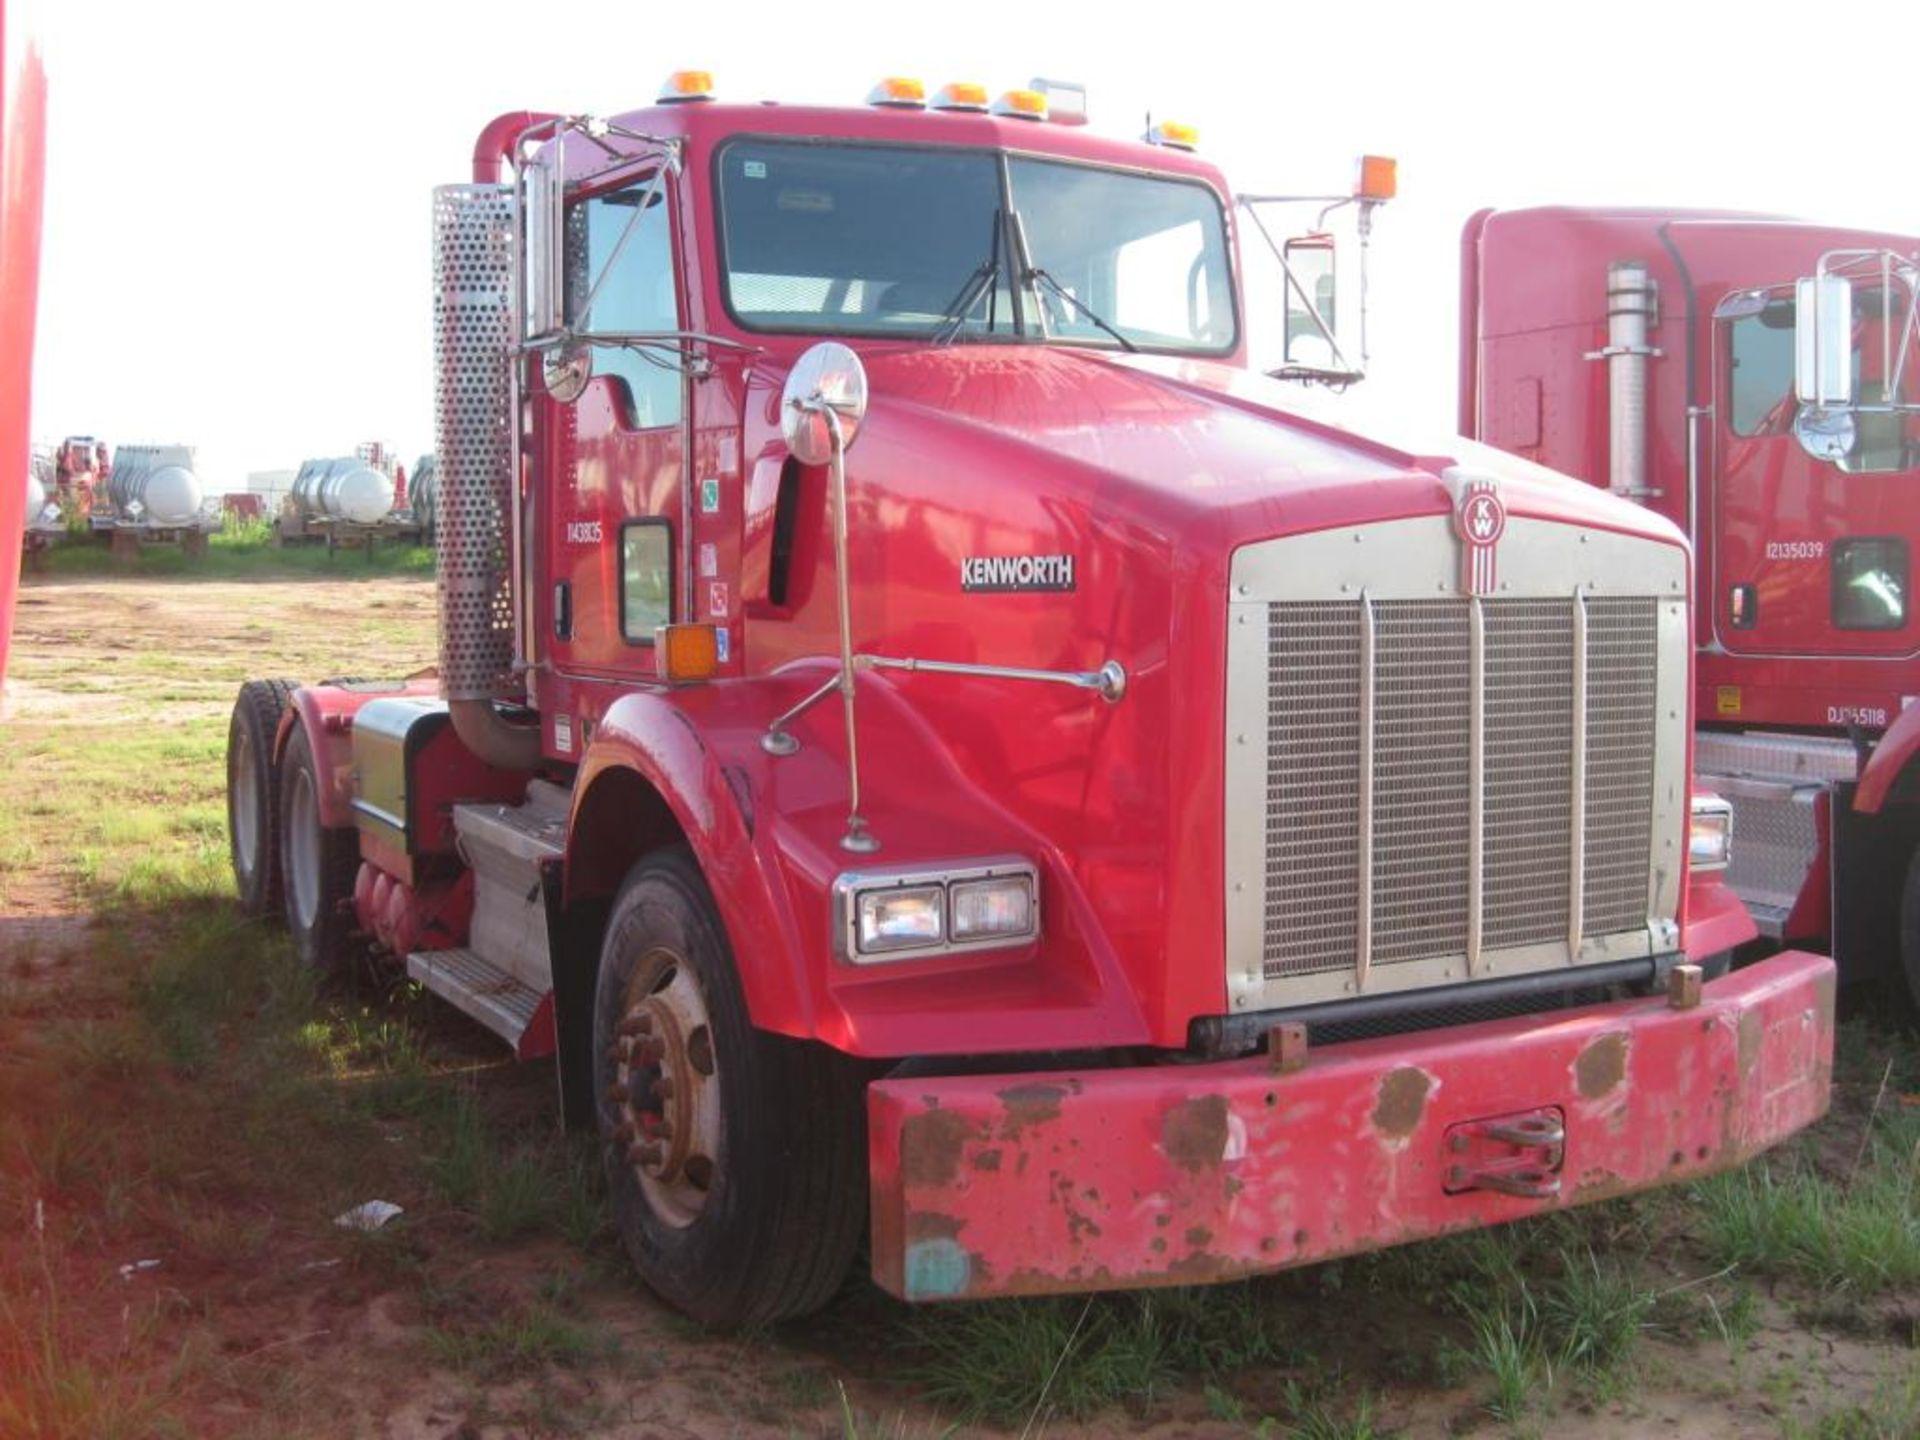 Kenworth Winch Truck - Image 2 of 22